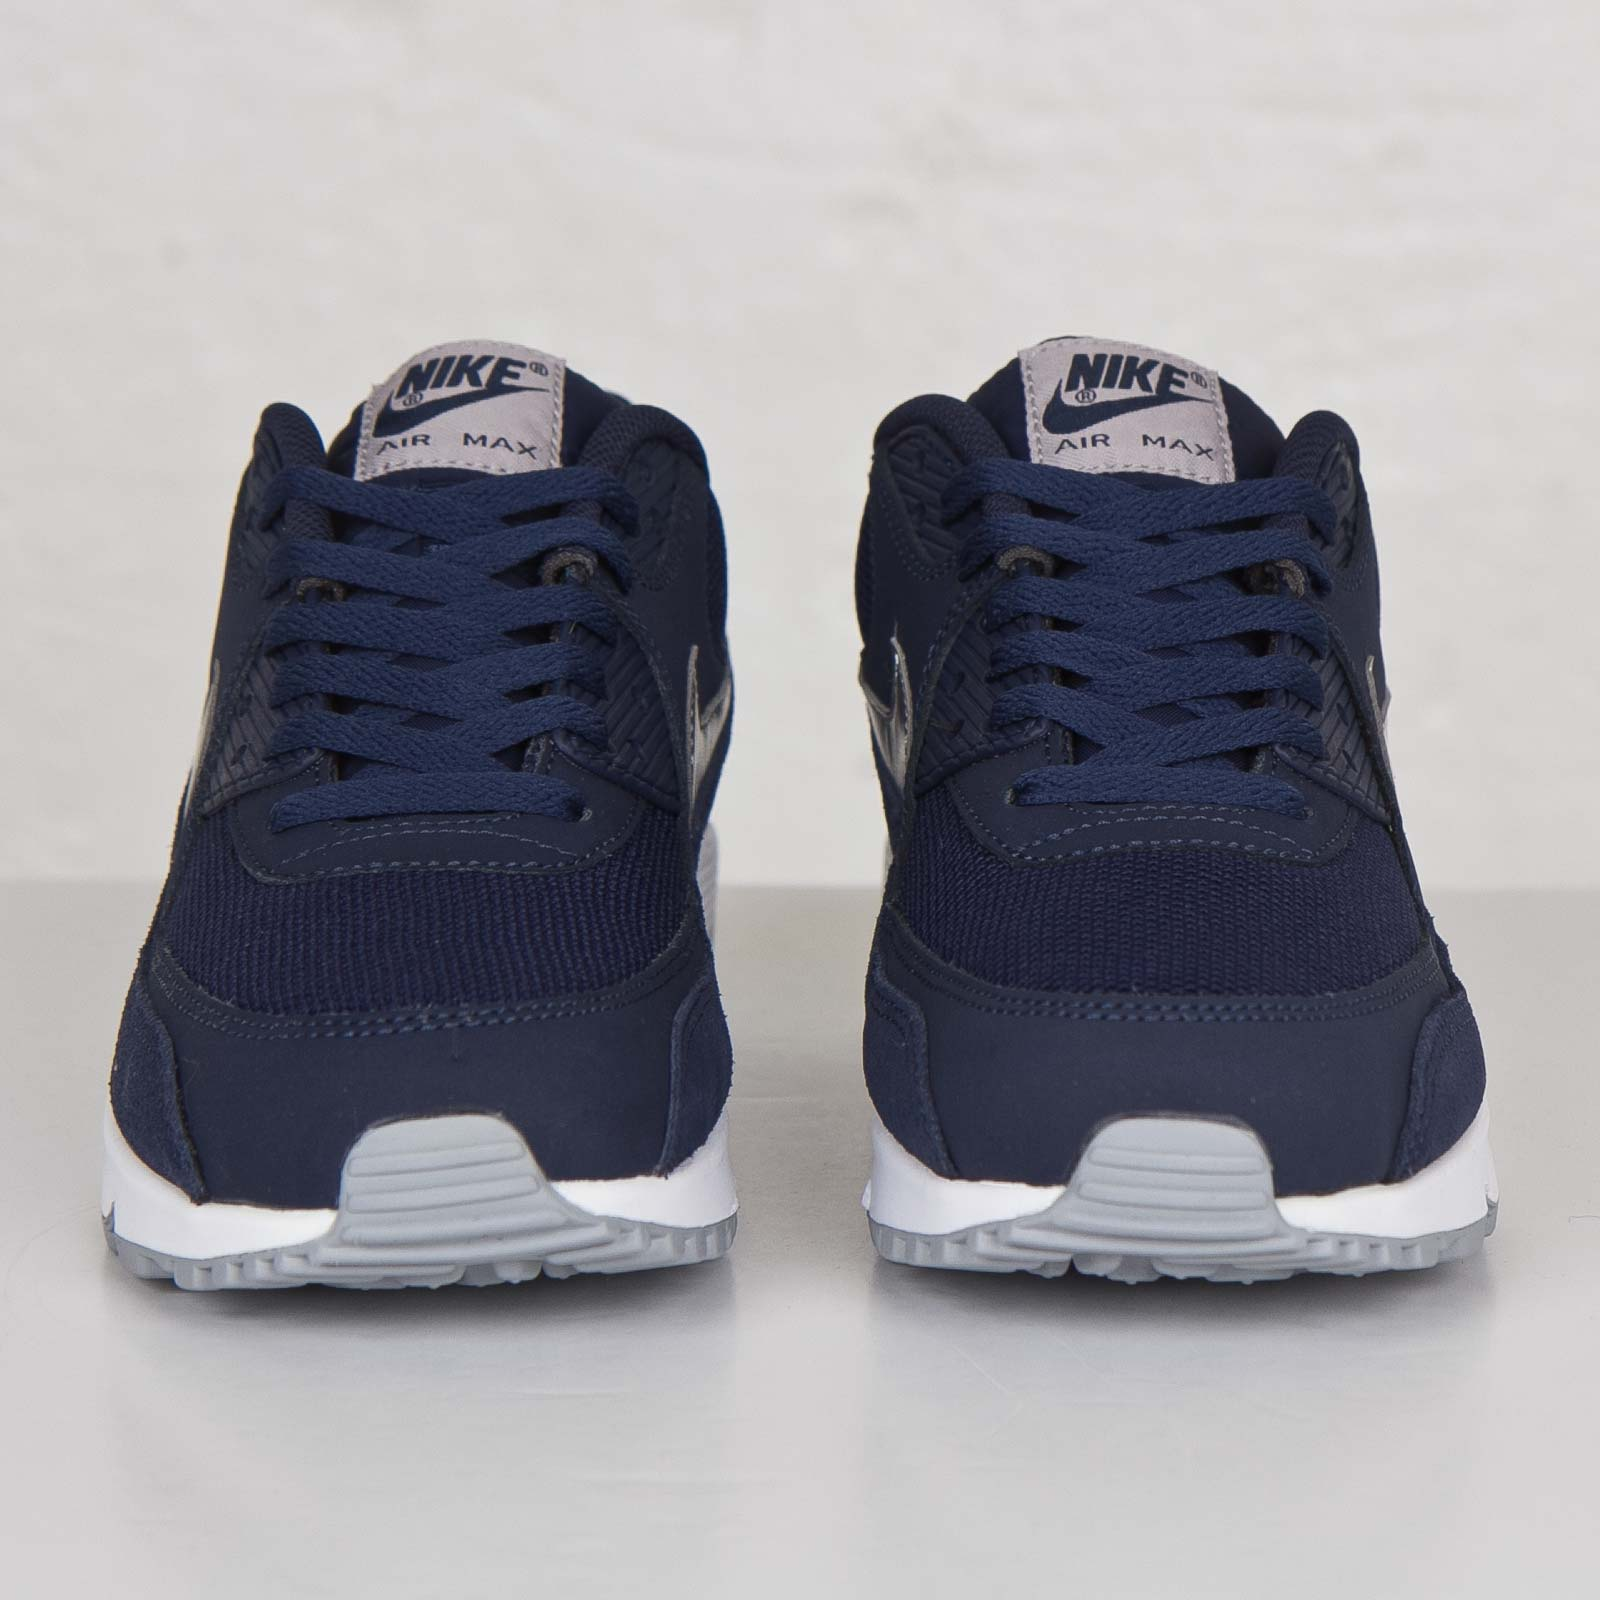 3f4e11901e7 Nike Air Max 90 Essential - 537384-411 - Sneakersnstuff